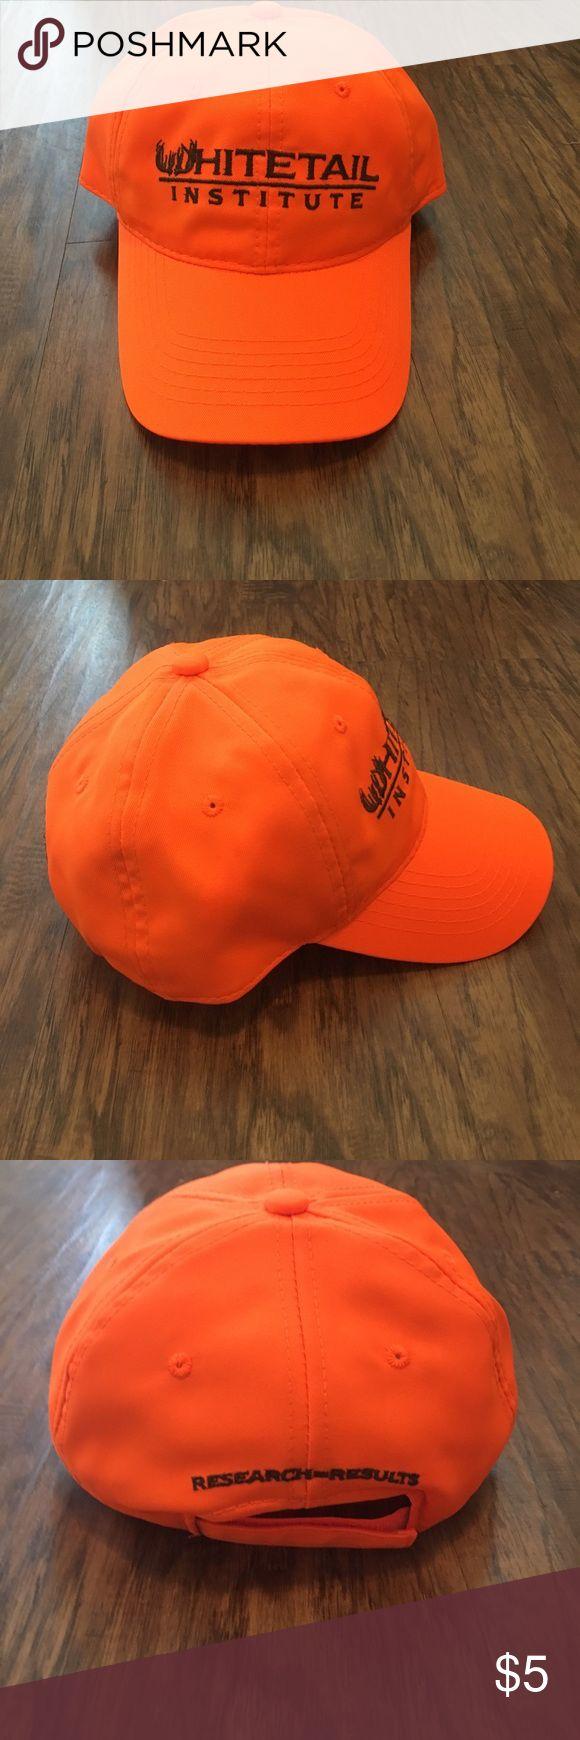 WHITETAIL INSTITUTE ORANGE HAT Brand new perfect whitetail institute Accessories Hats